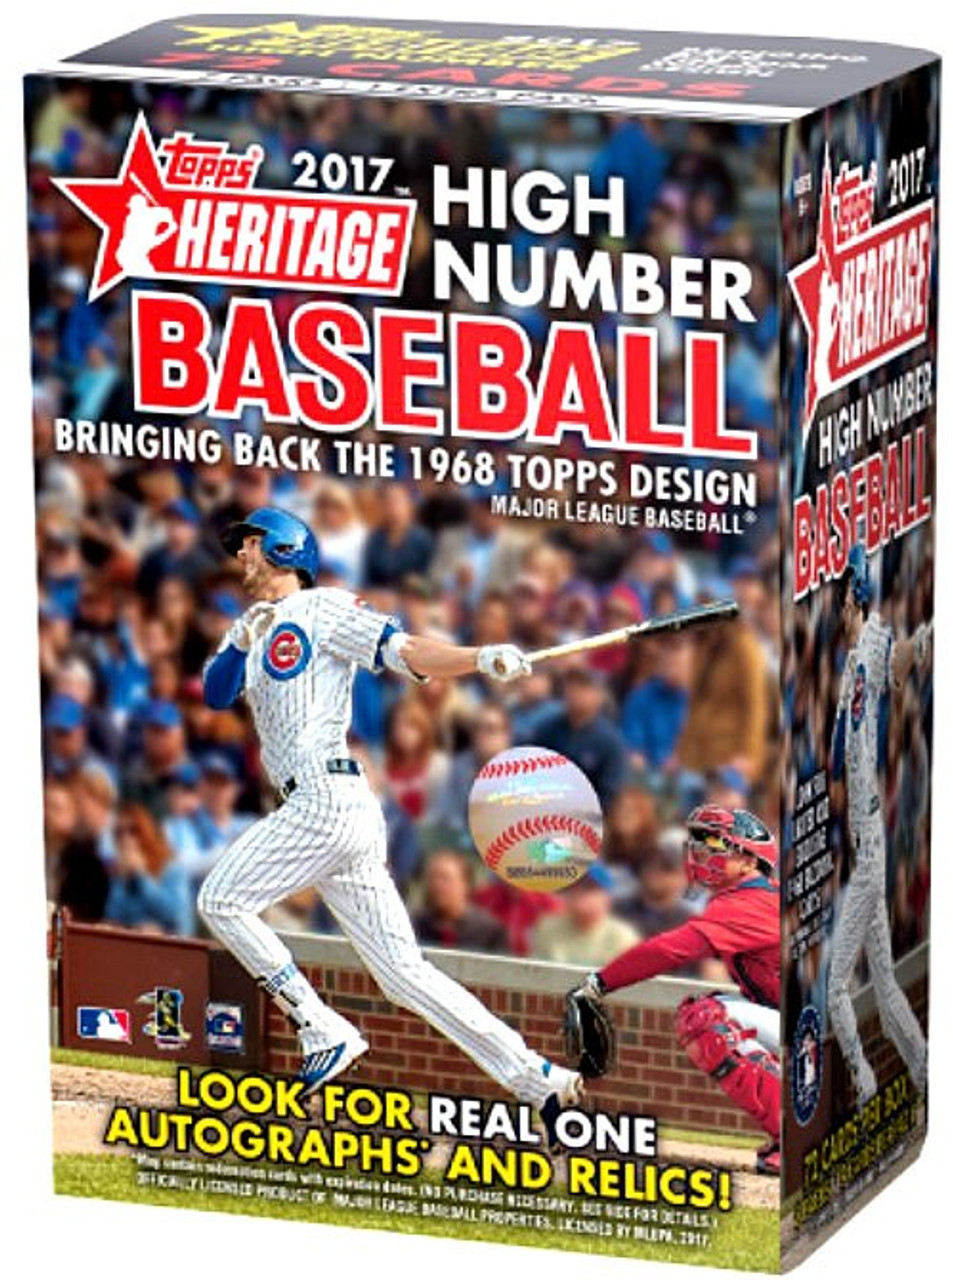 Mlb 2017 Topps Heritage Baseball Trading Card Blaster Box High Number